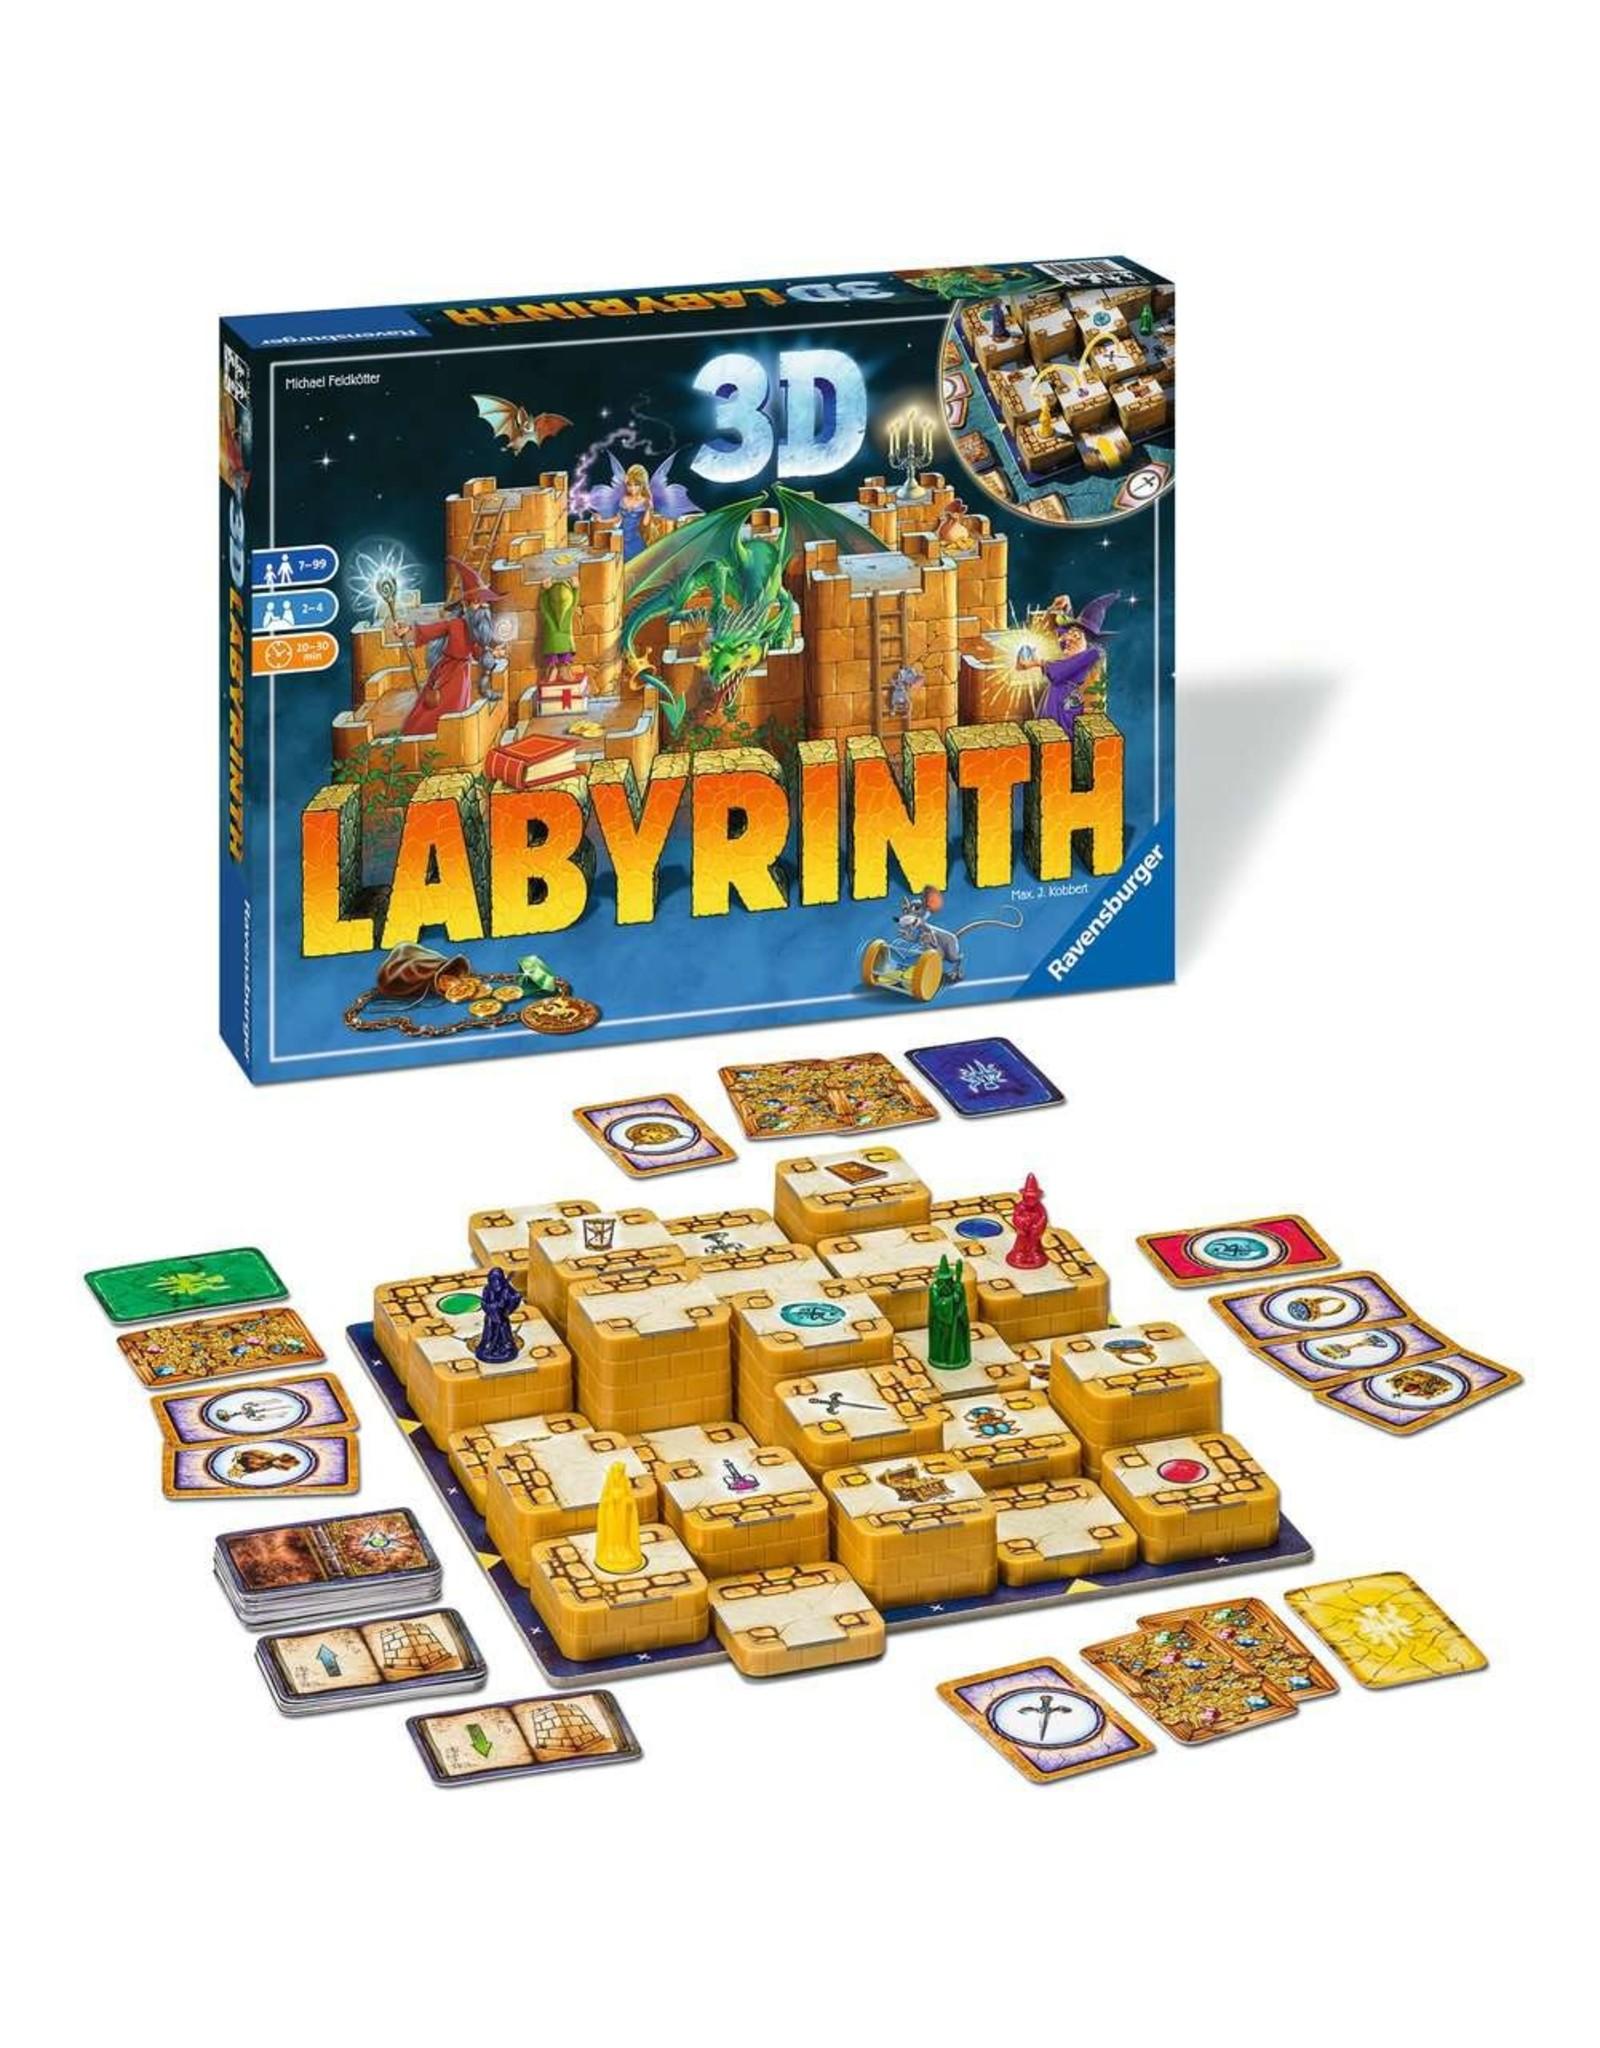 Ravensburger 3D Labyrinth Game